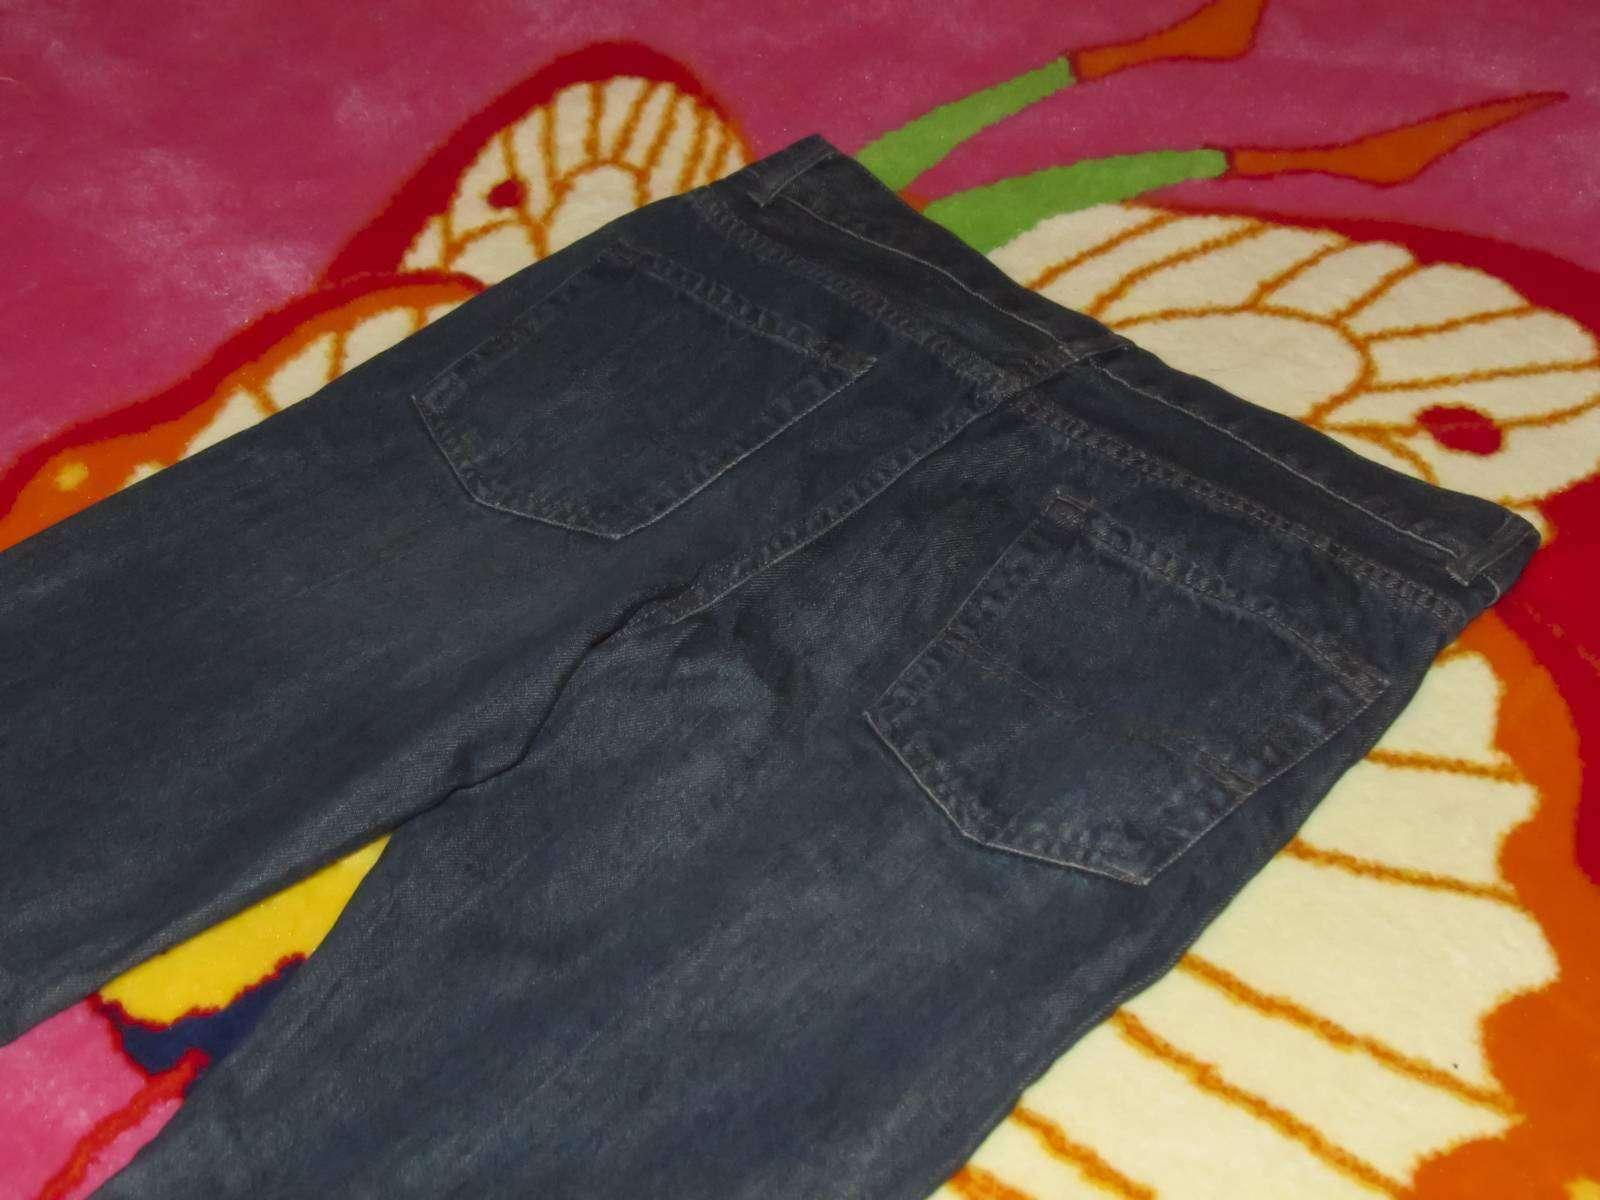 Childrens Place: Классические джинсы на мальчика, Boys Basic Straight Jeans - Dry Indigo Wash - размер 16